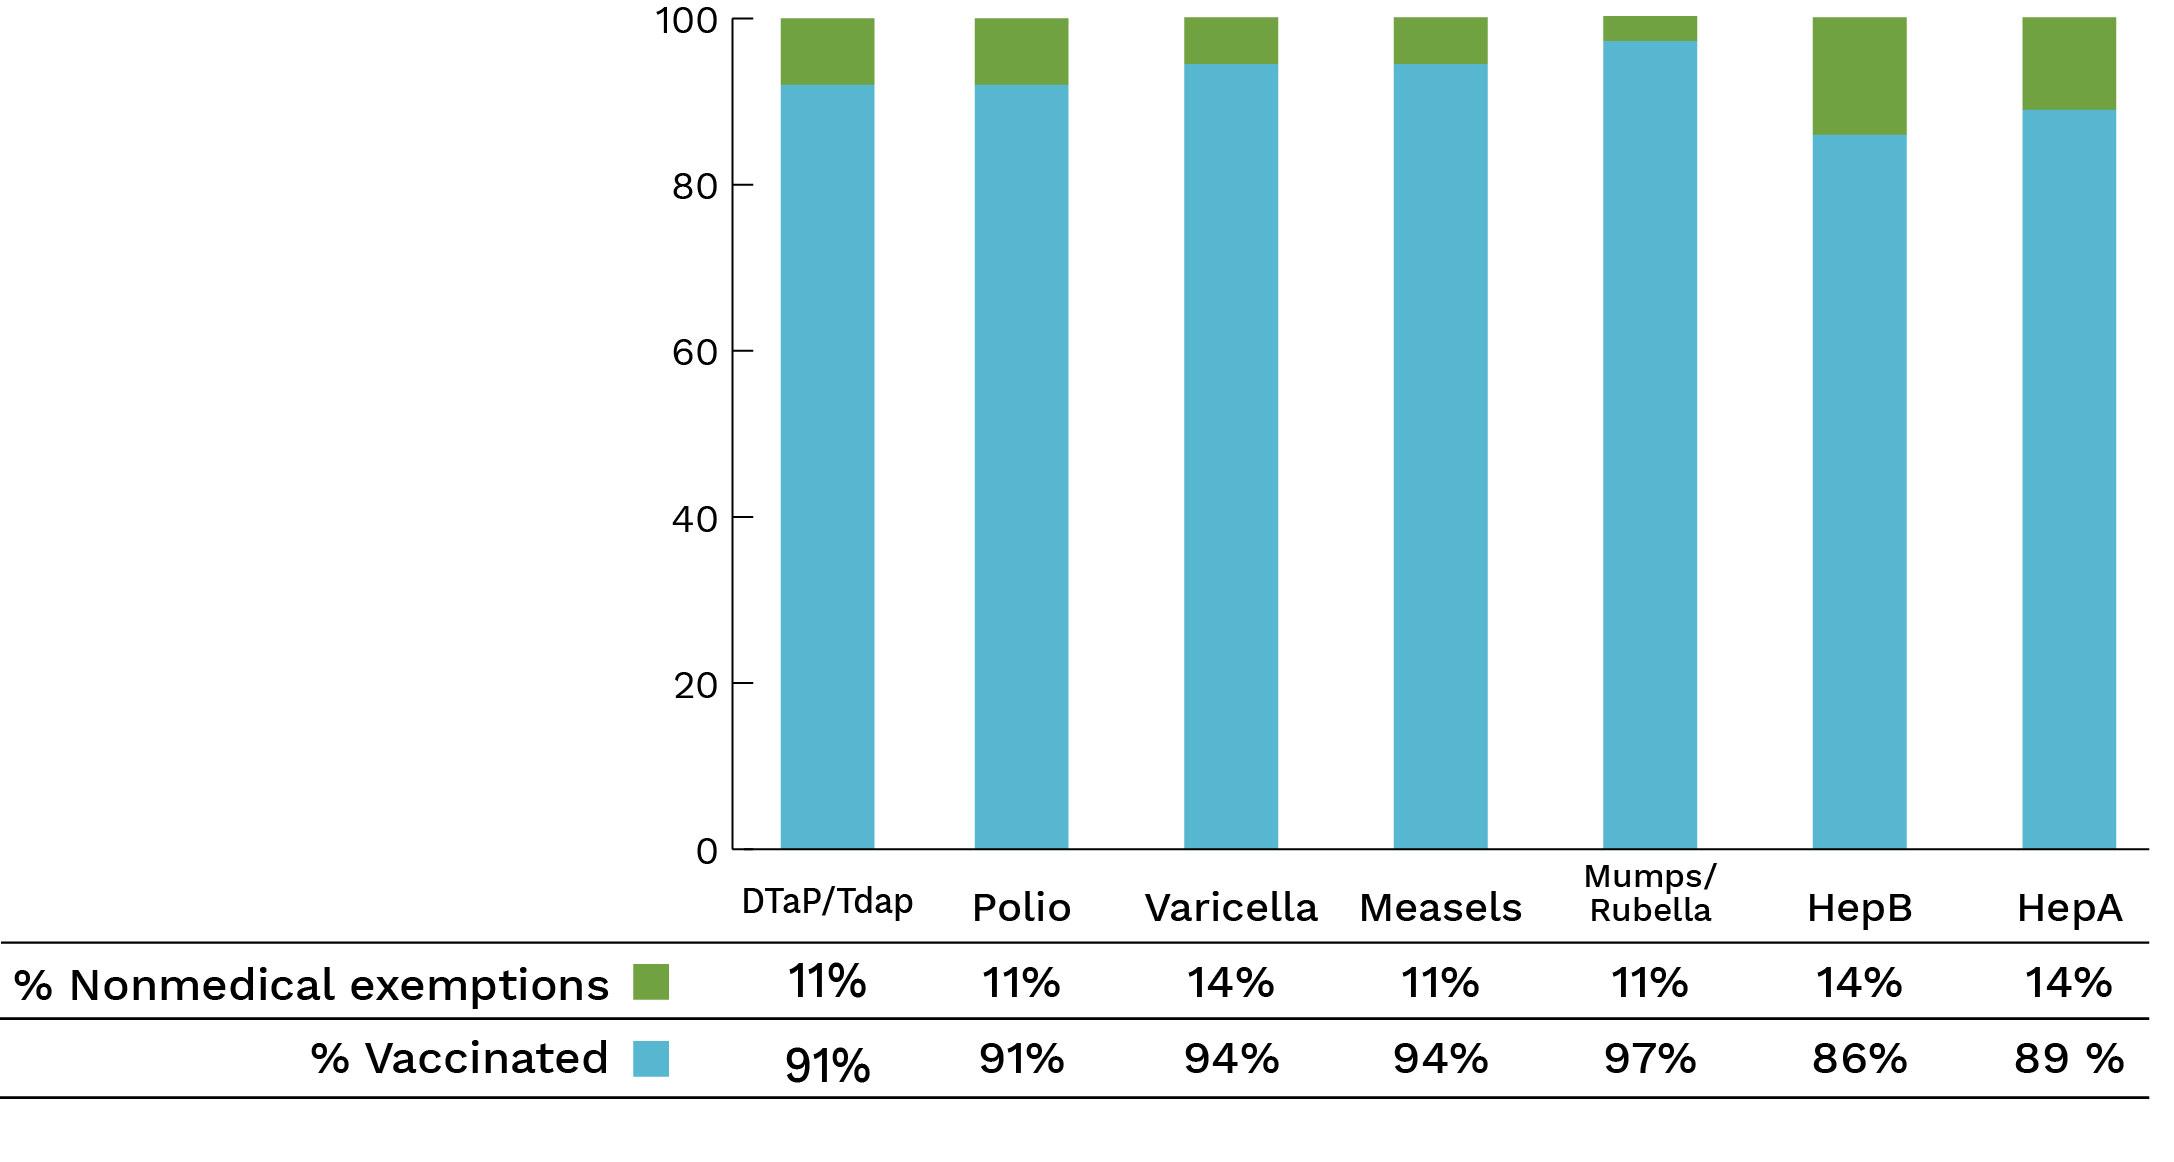 mcminnville-montessori-elementary-immunization-data_032019.jpg